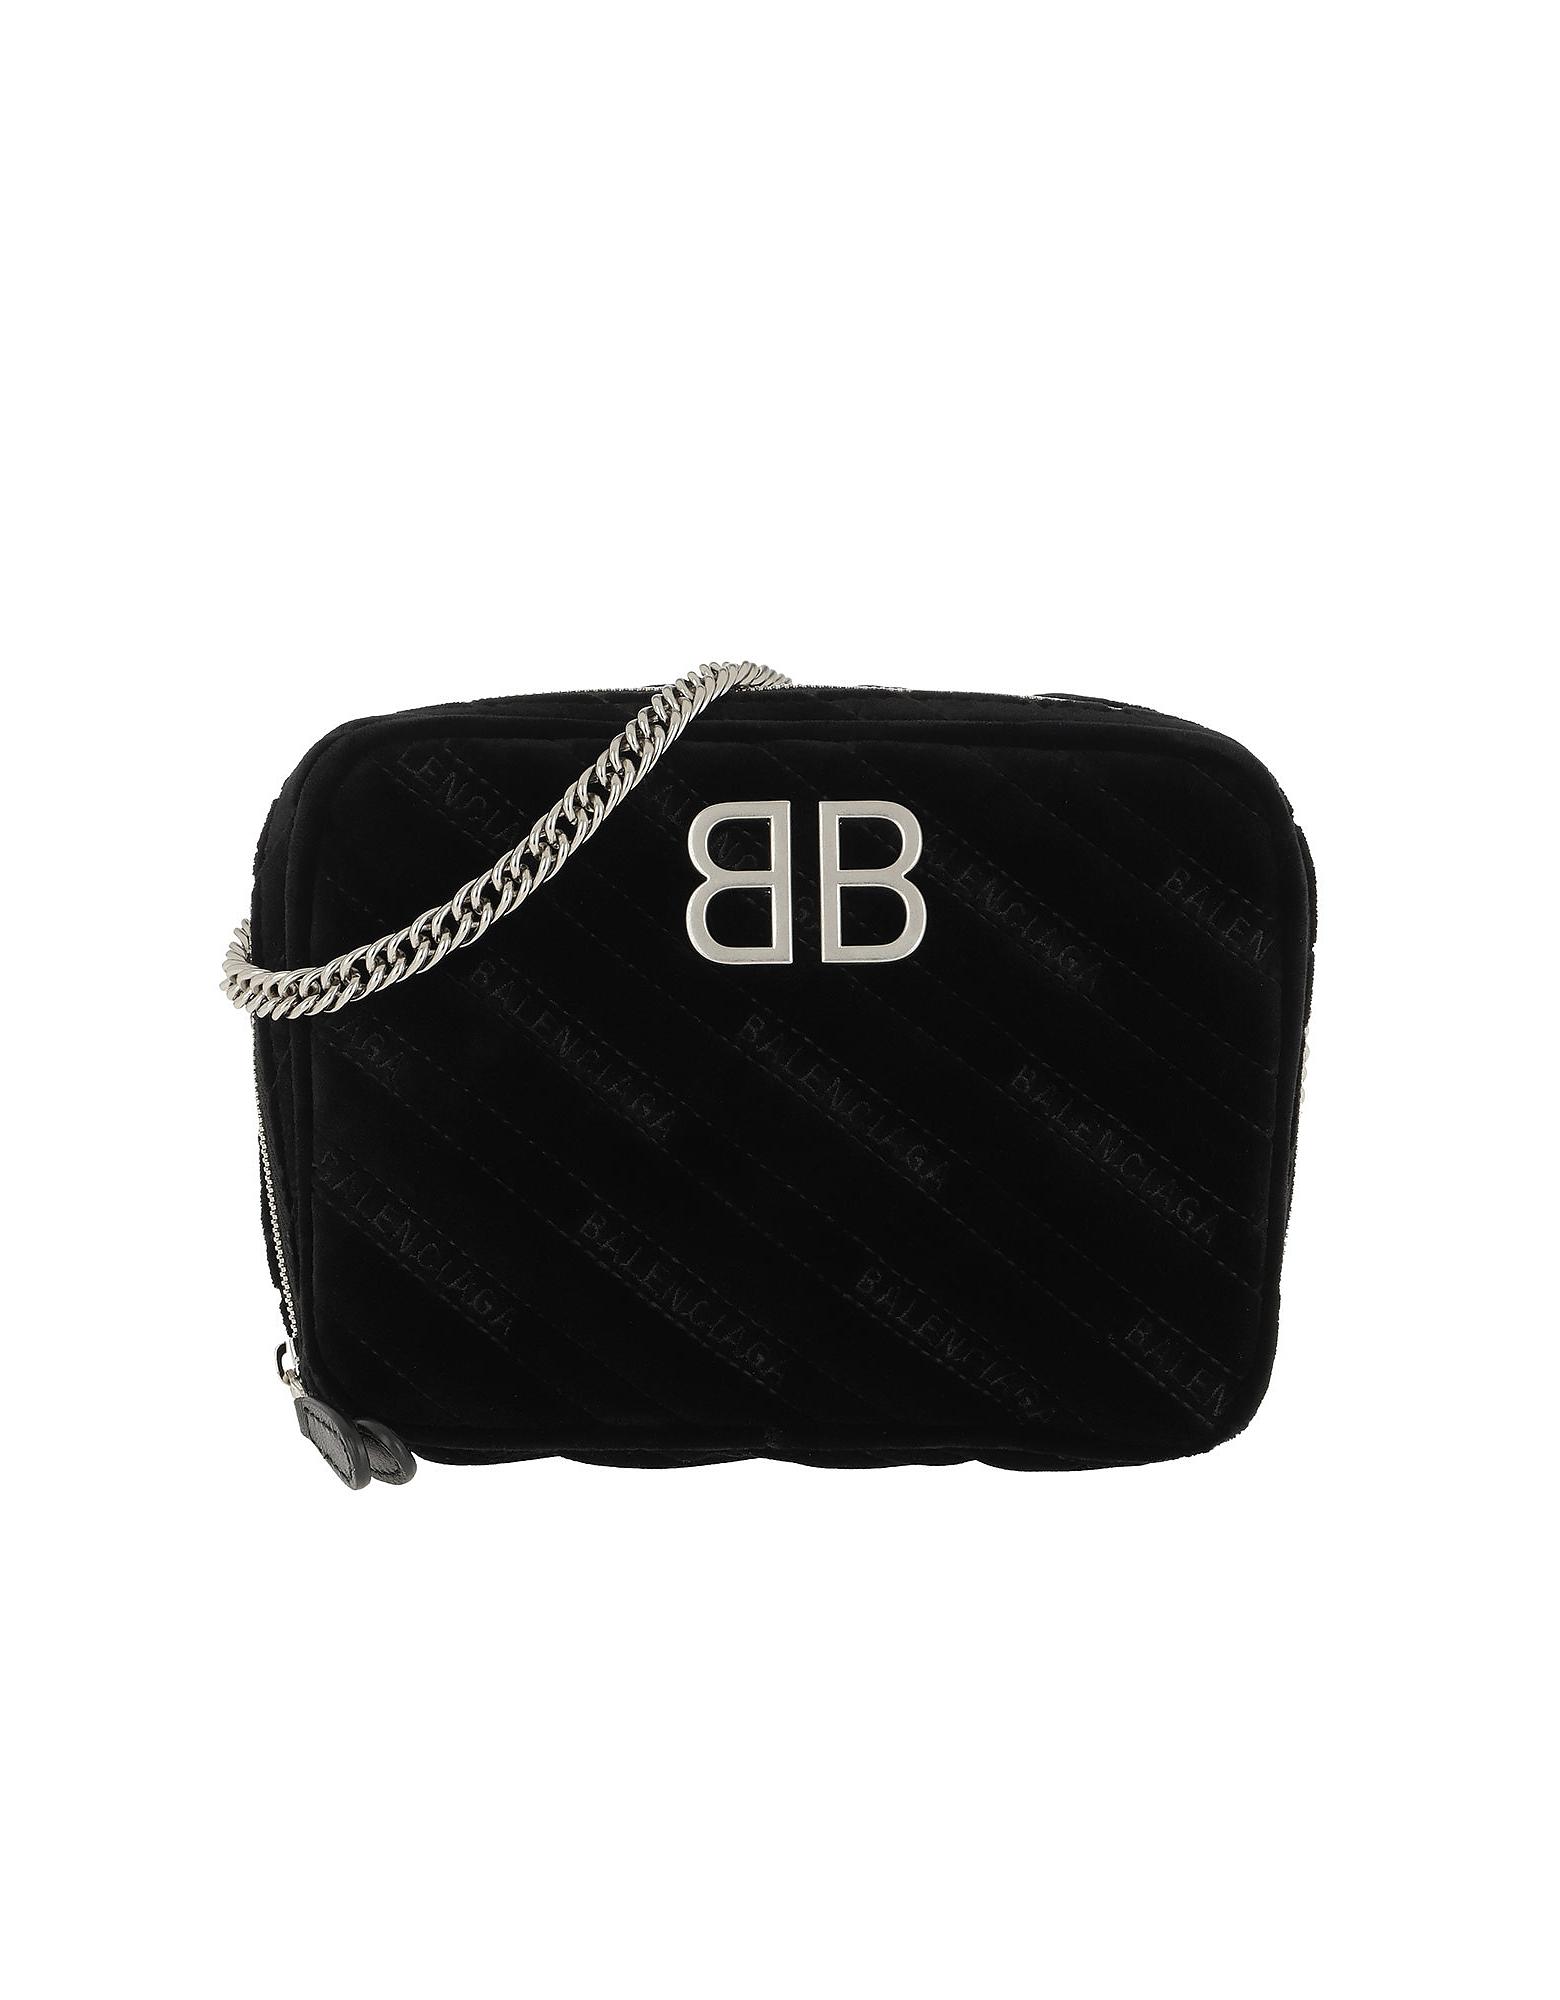 BB Camera Bag Leather Black